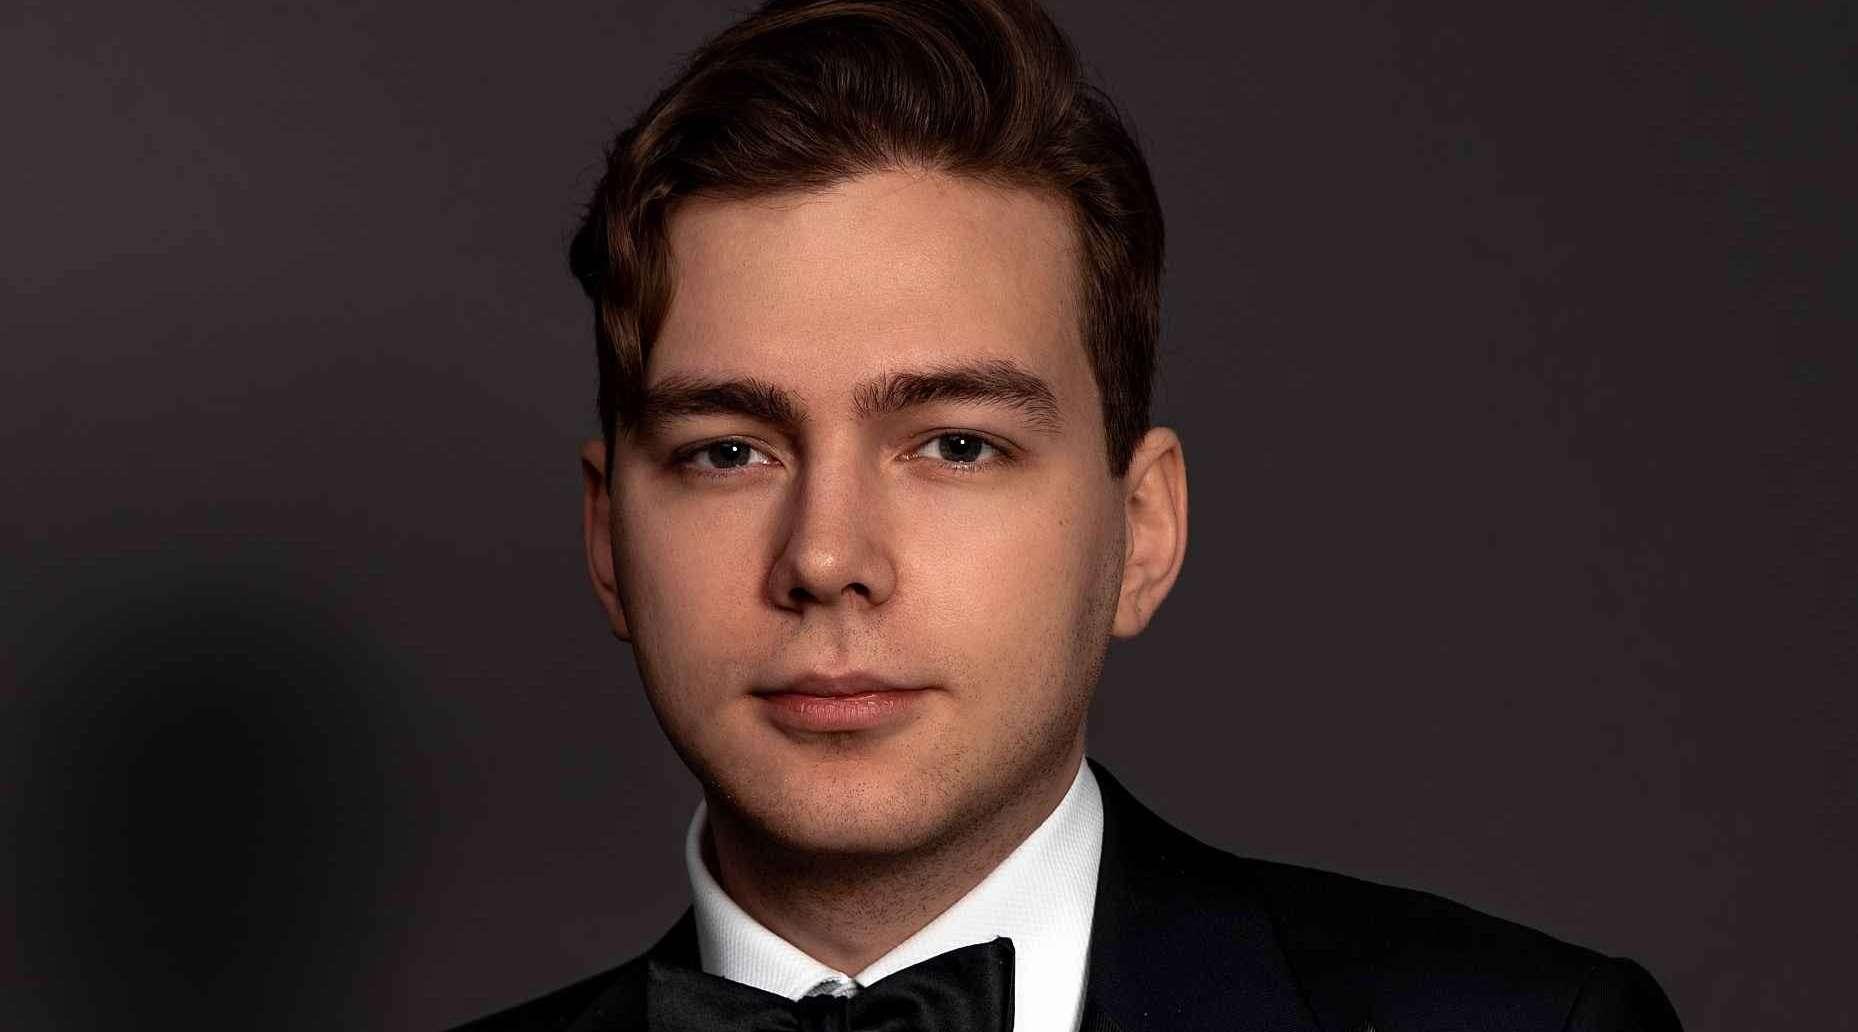 TACT welcomes Žilvinas Steponas Miškinis for General Management